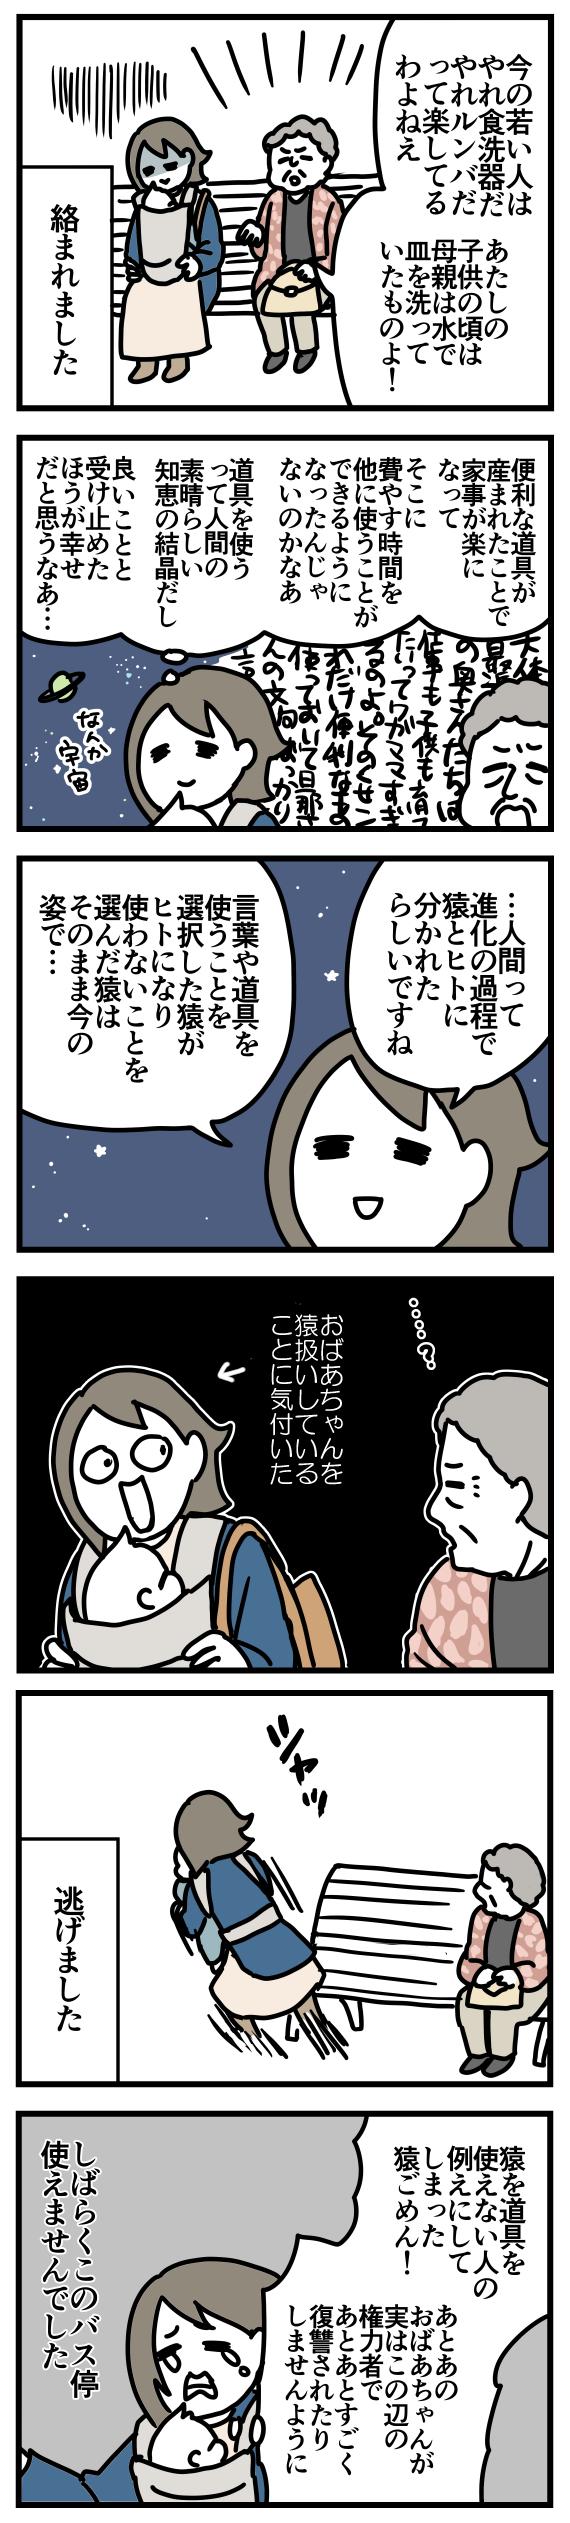 f:id:kanemotonomukuu:20171006104052j:plain